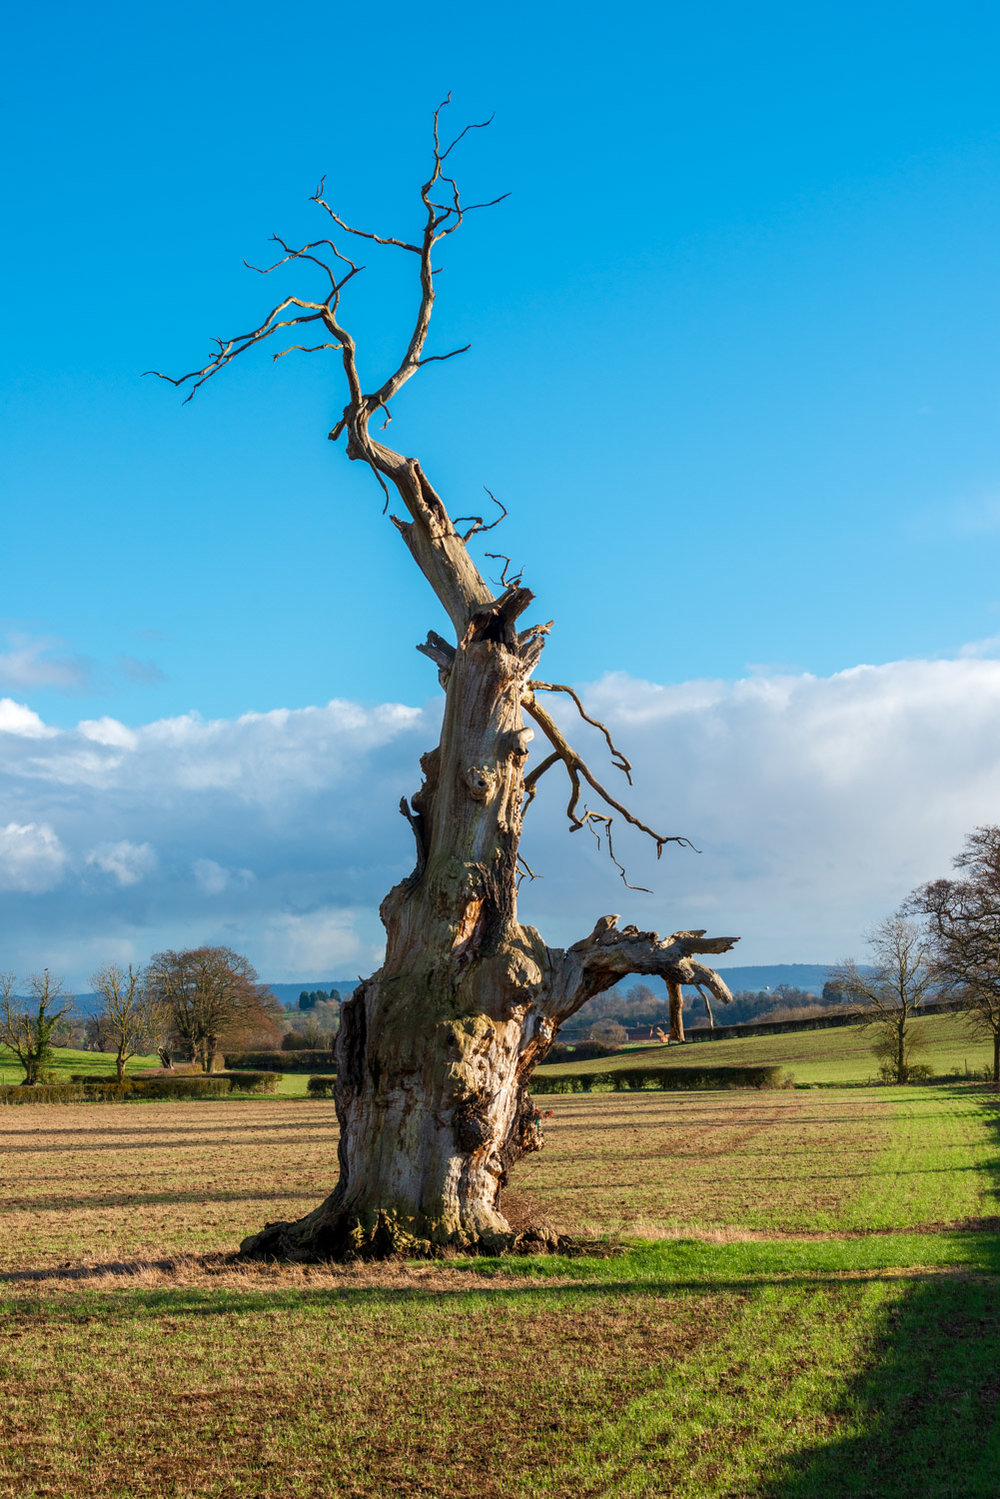 Zytynski-Winter-Oak-Trees-6.jpg